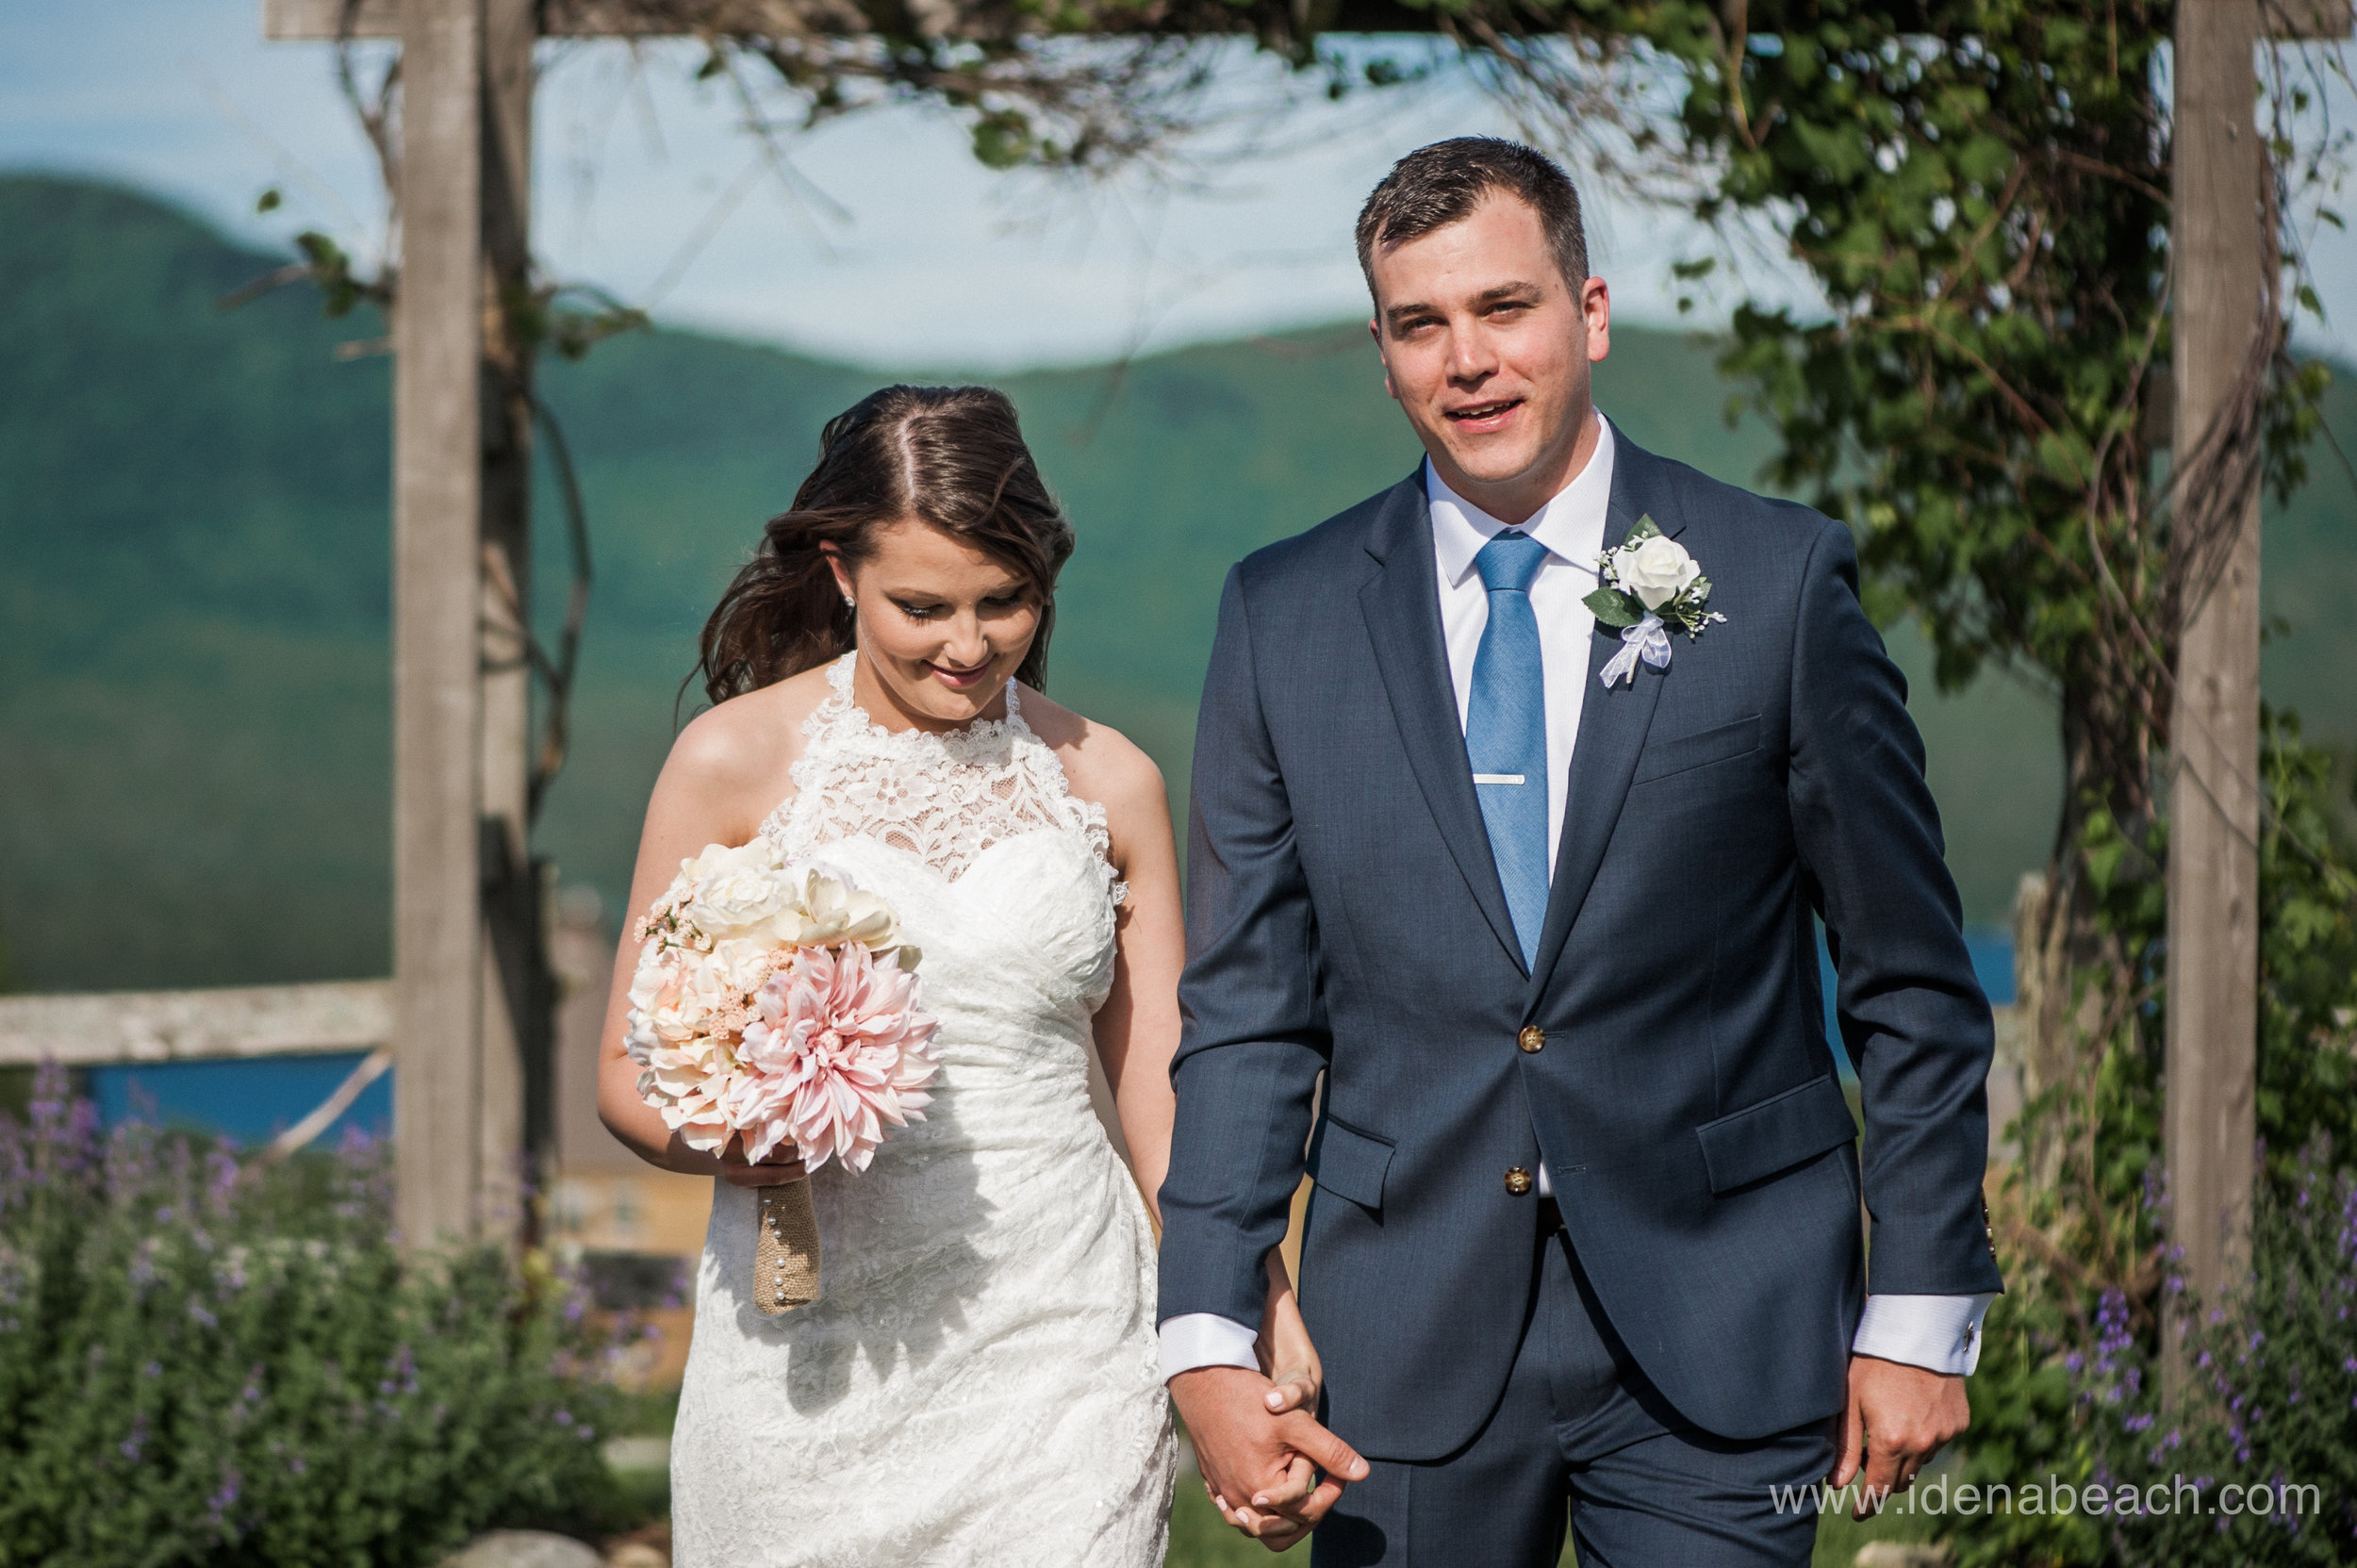 Mountain-Top-Inn-Vermont-Wedding-Photographer-65.jpg